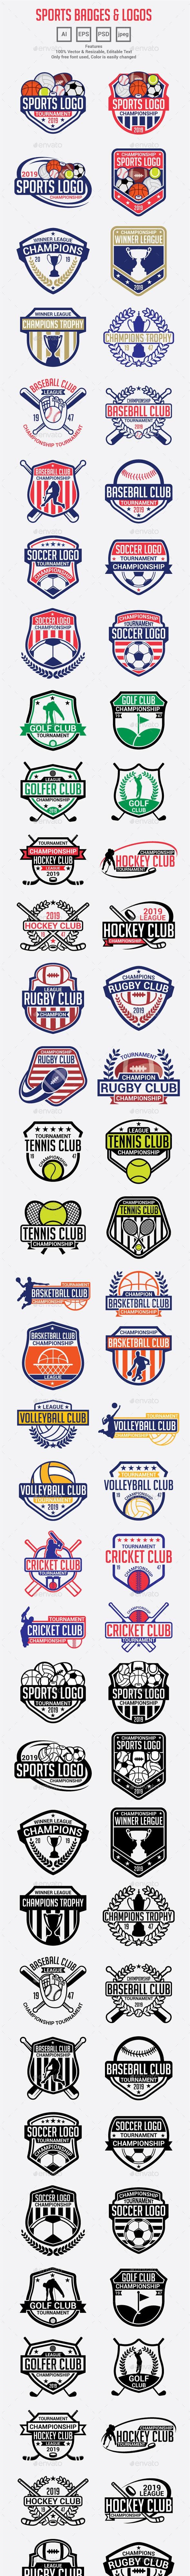 Sports Logo Badges - Badges & Stickers Web Elements